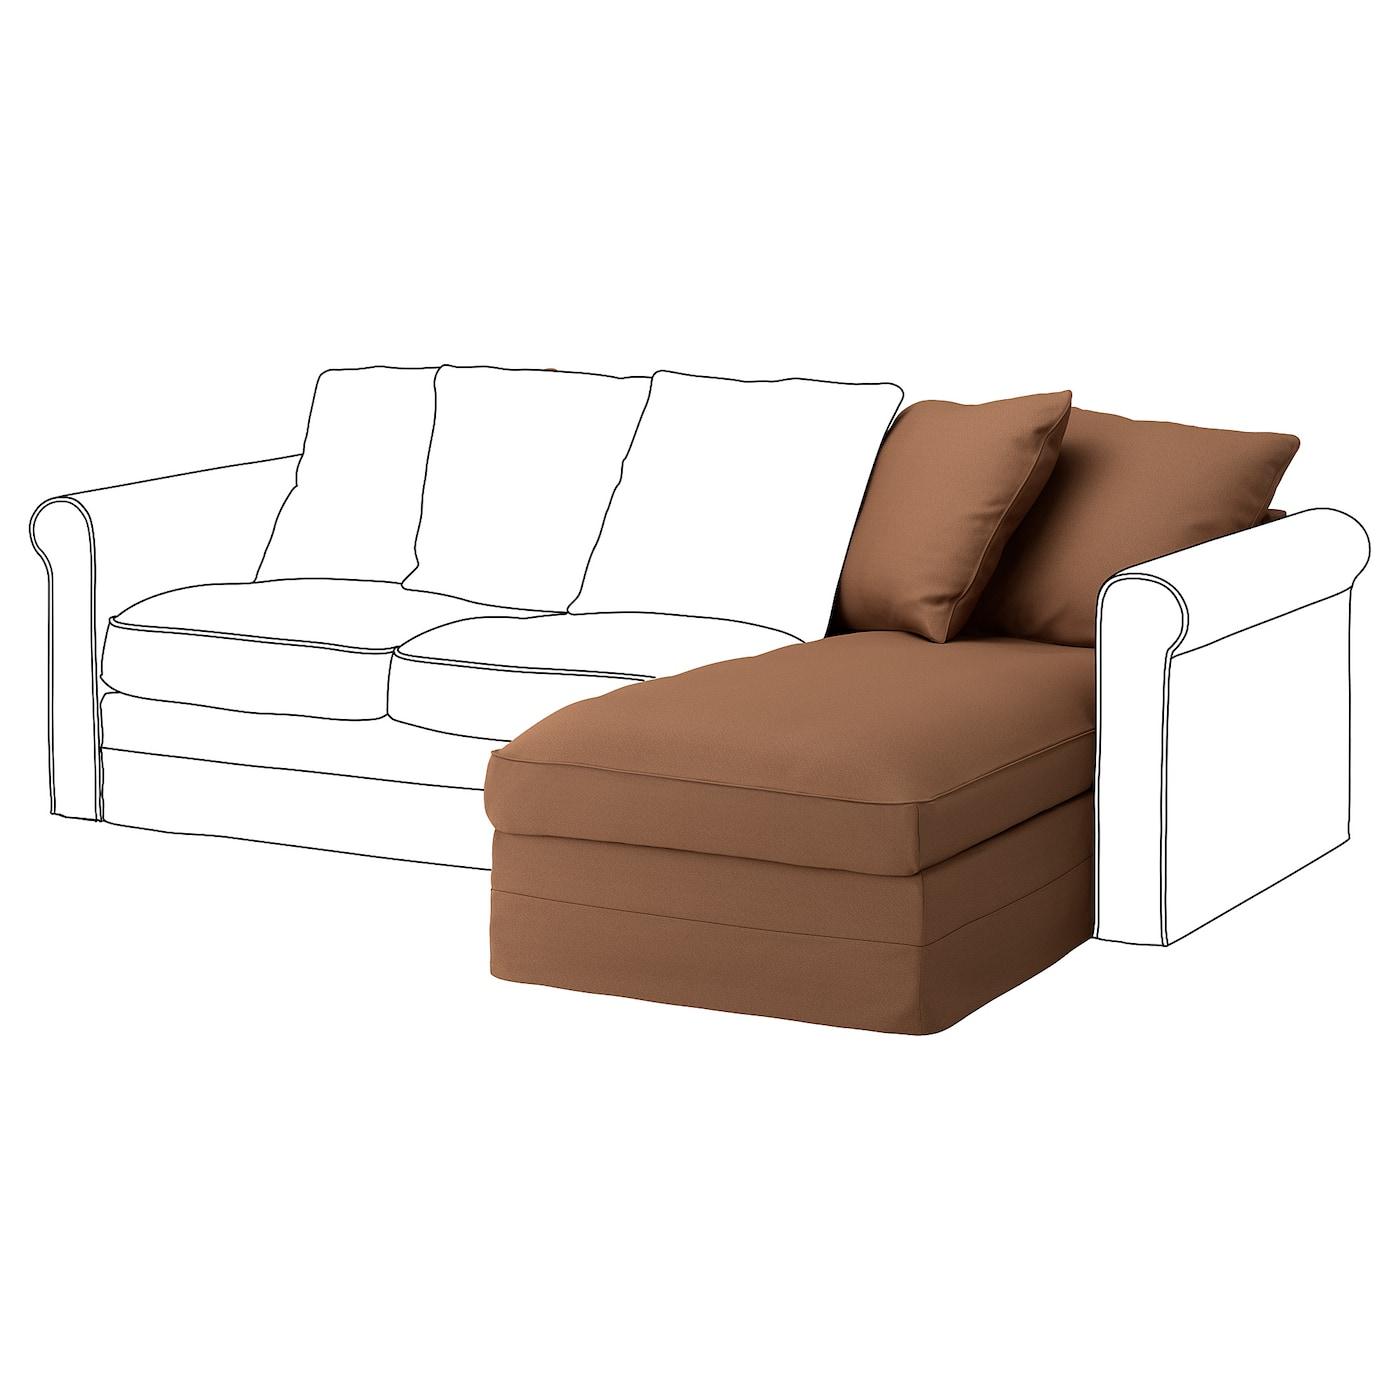 Fabric Chaise Longue Ikea